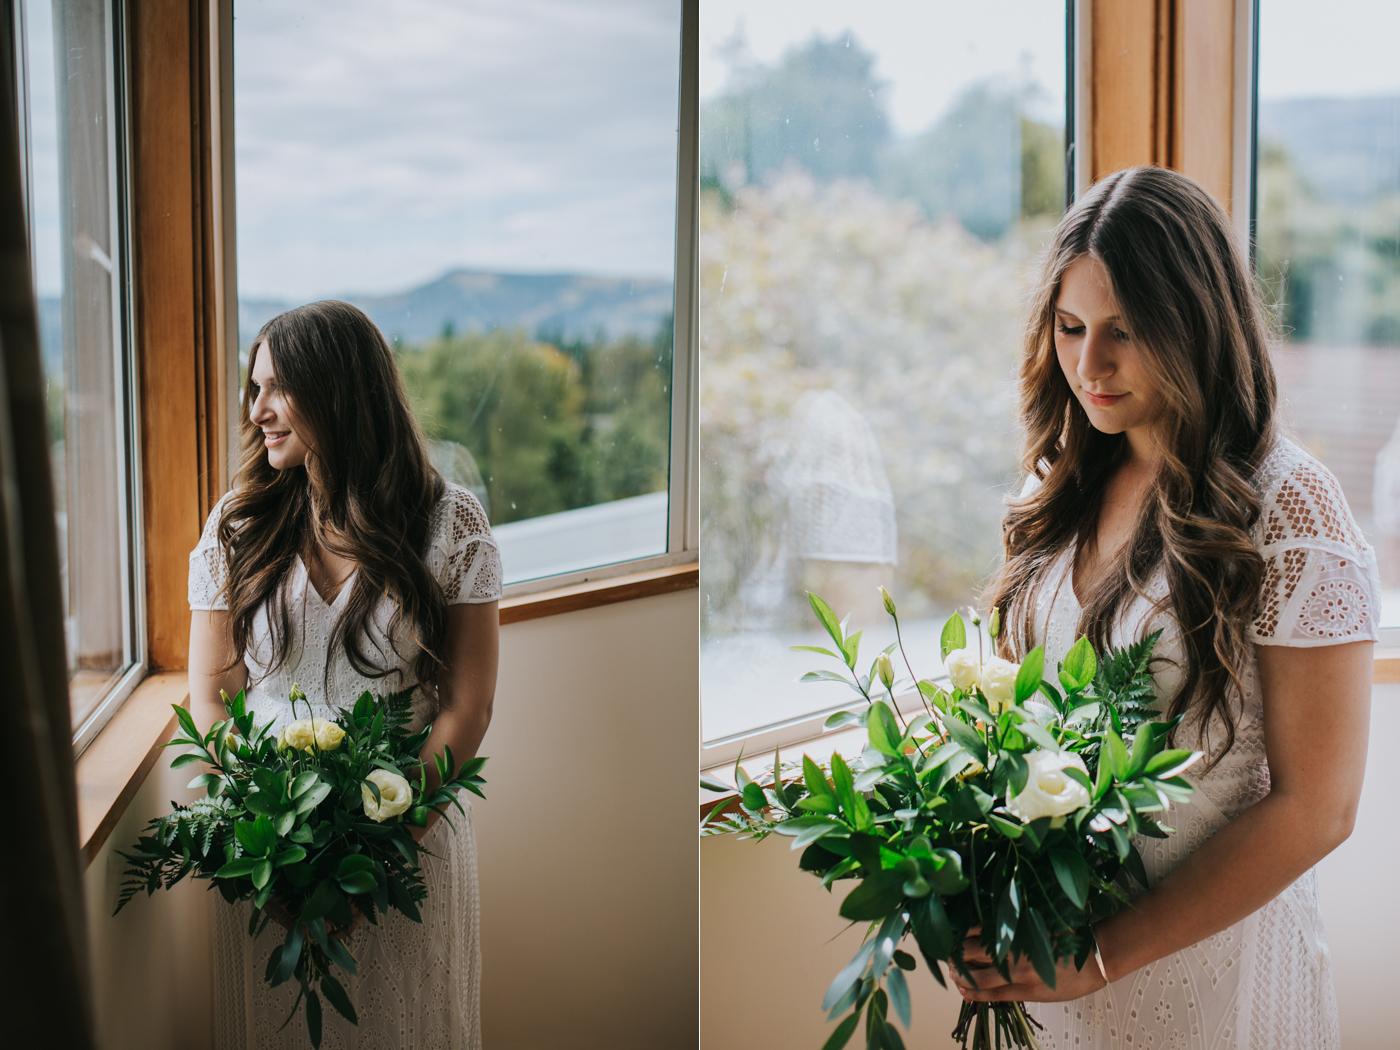 Ariana & Tim - Dunedin, New Zealand Wedding - Destination Wedding - Samantha Heather Photography-47.jpg